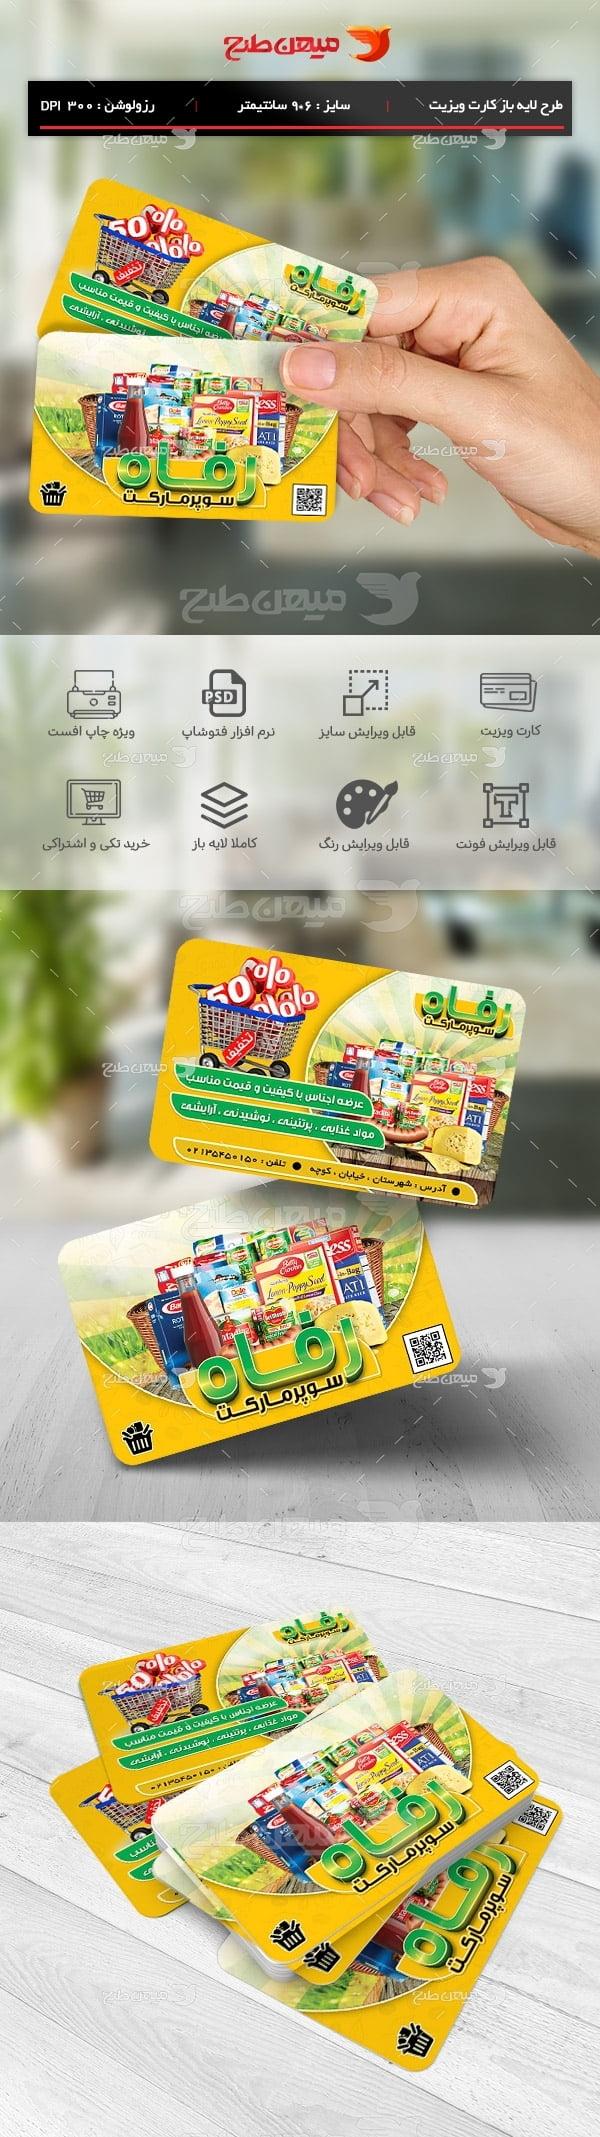 طرح لایه باز کارت ویزیت تبلیغاتی سوپر مارکت